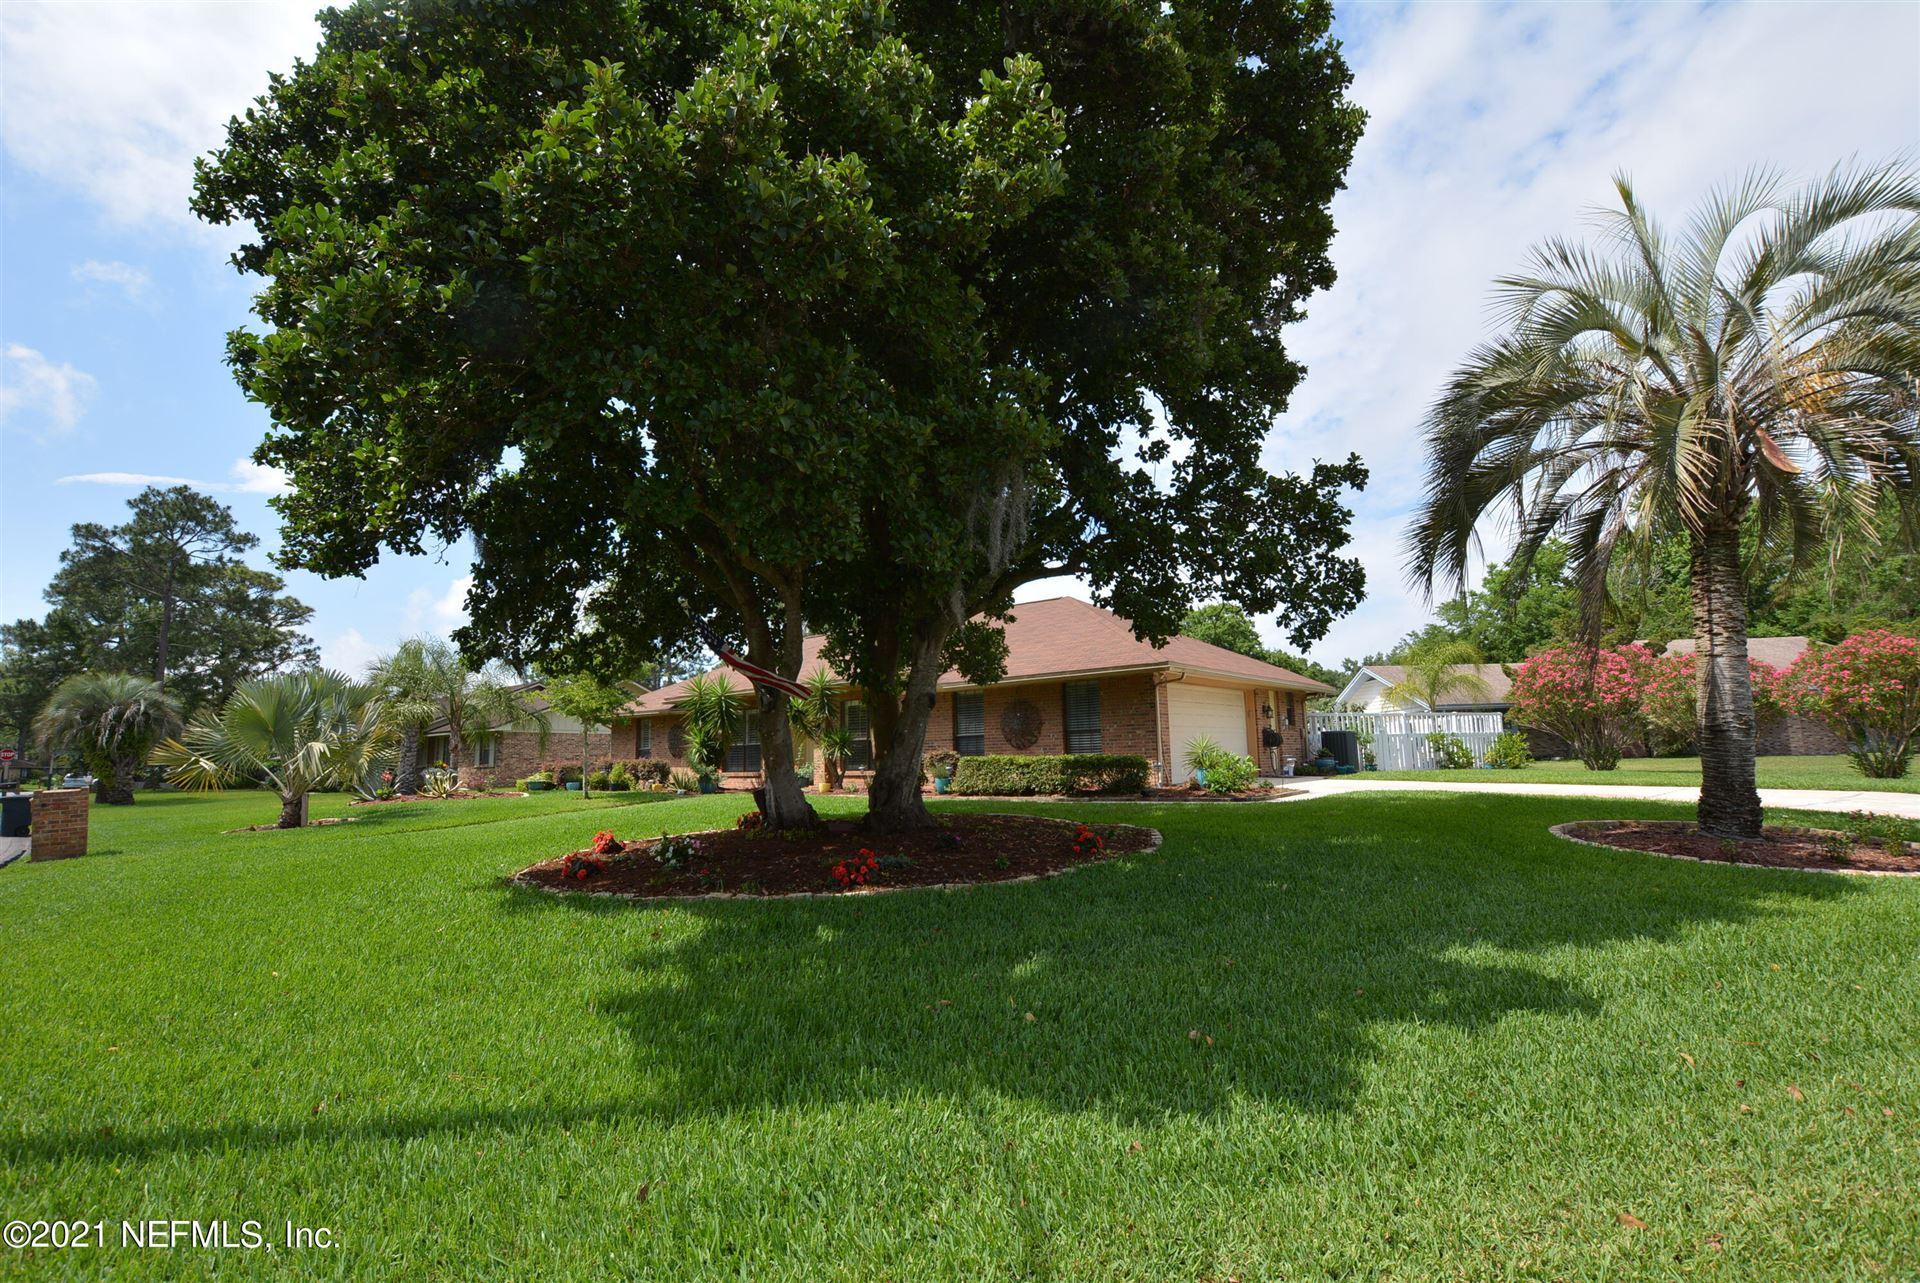 Photo of 2317 FALLEN TREE DR W #Unit No: 11 Lot No:, JACKSONVILLE, FL 32246 (MLS # 1108685)